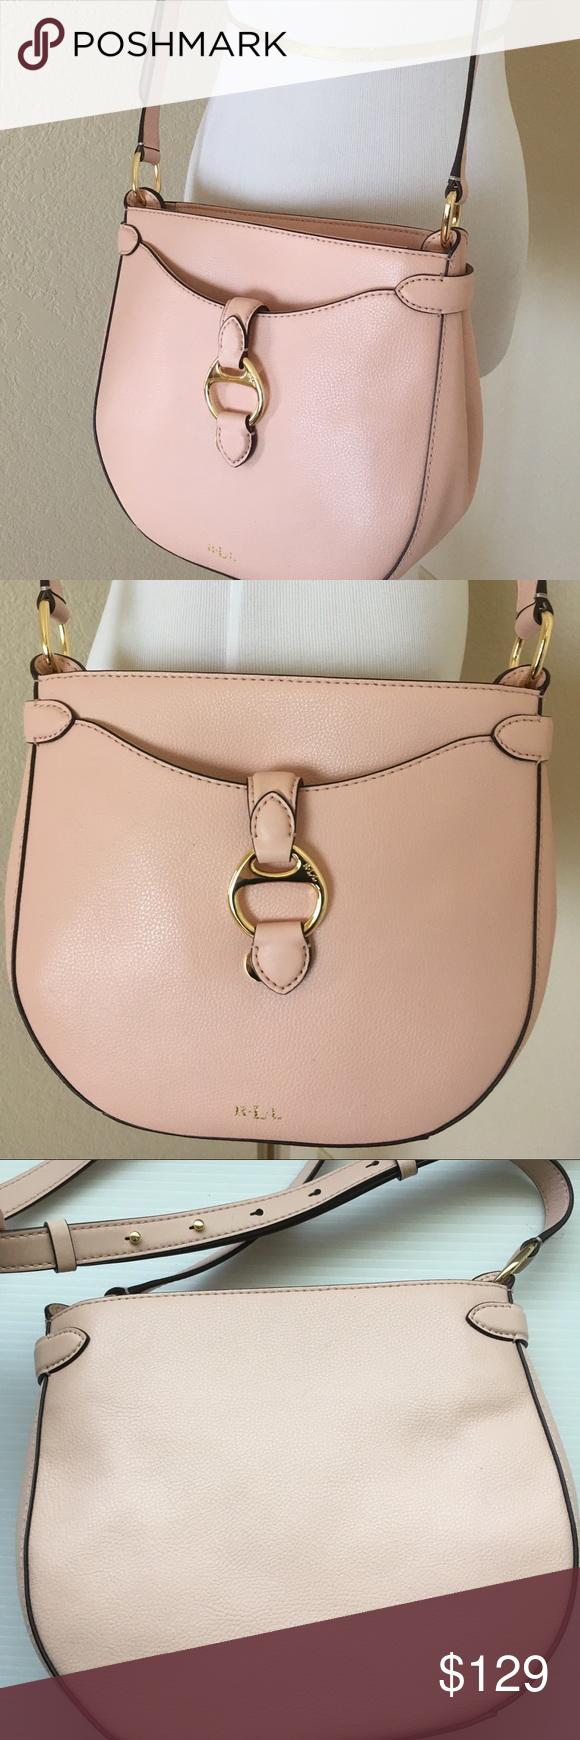 Spotted while shopping on Poshmark  Ralph Lauren Pink cross body leather bag  new!  poshmark  fashion  shopping  style  Ralph Lauren  Handbags 42d93f0552